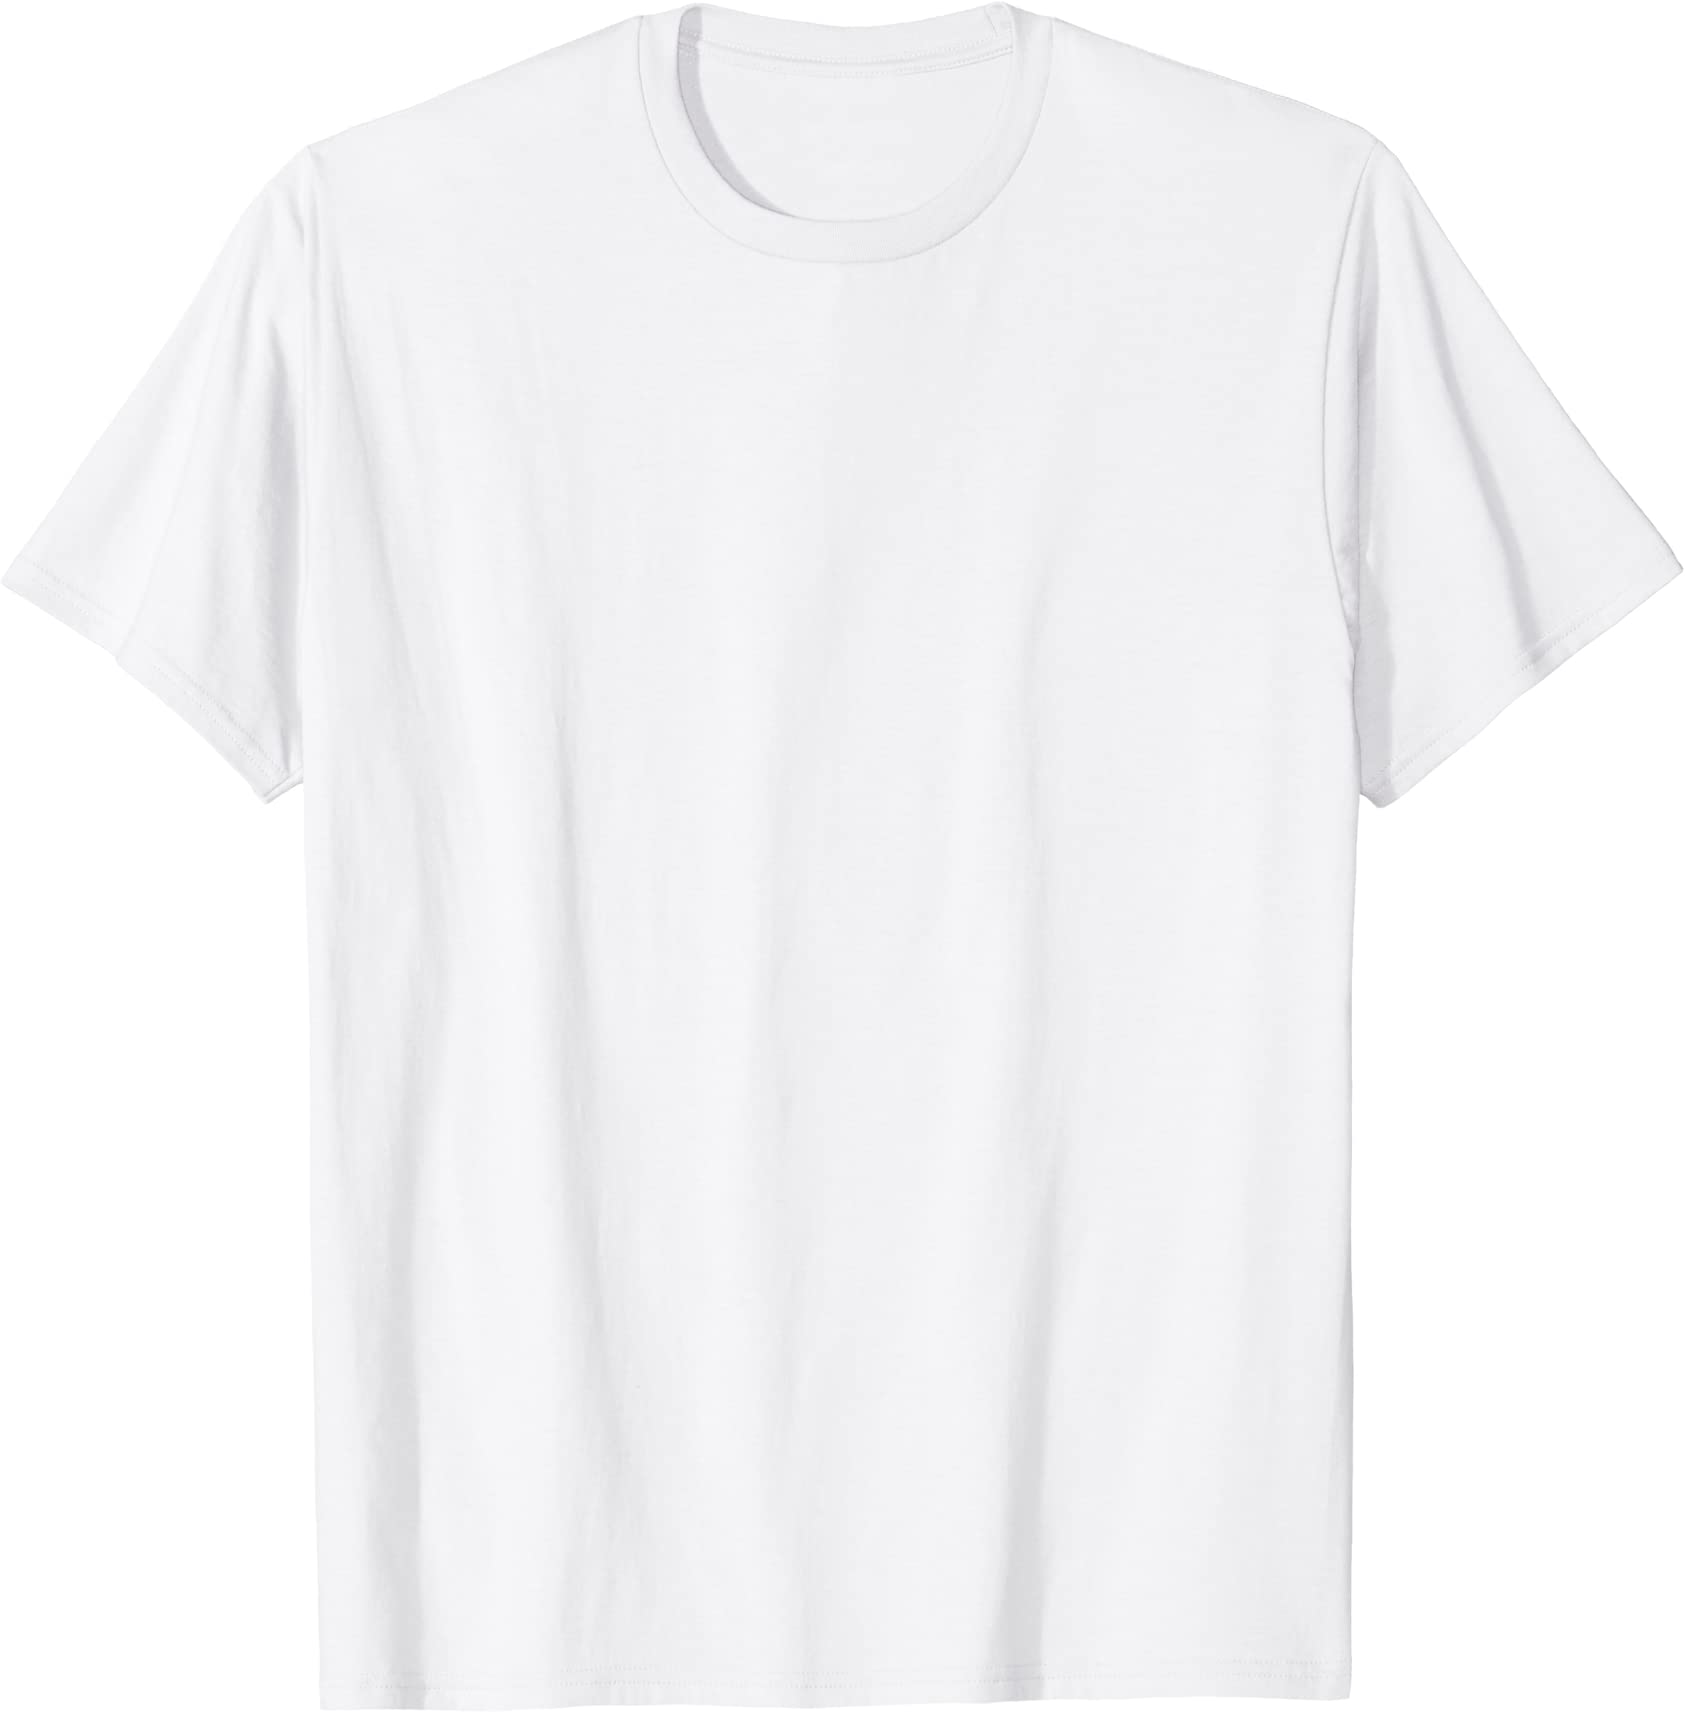 Paddle Faster Mens T Shirt Funny Joke Gift Present Idea Retro Cool Gift Idea